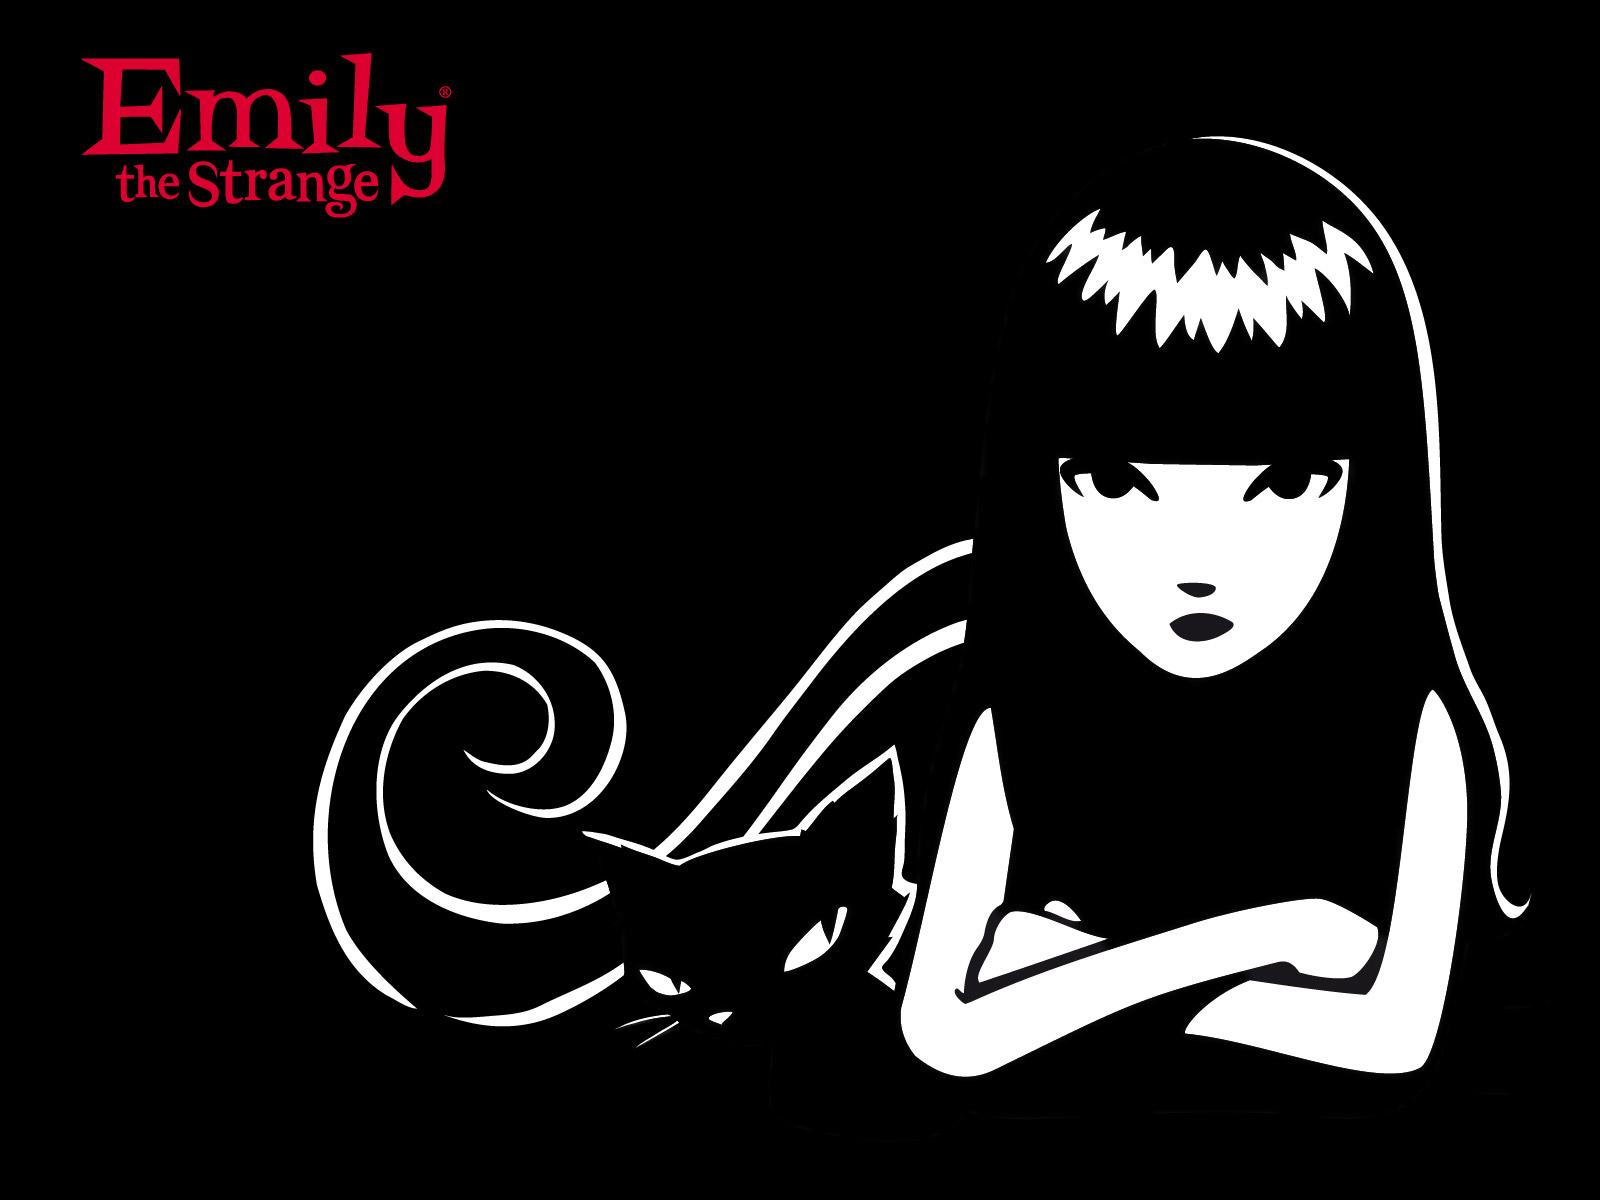 Amazon Studios trabaja en película animada de Emily the Strange